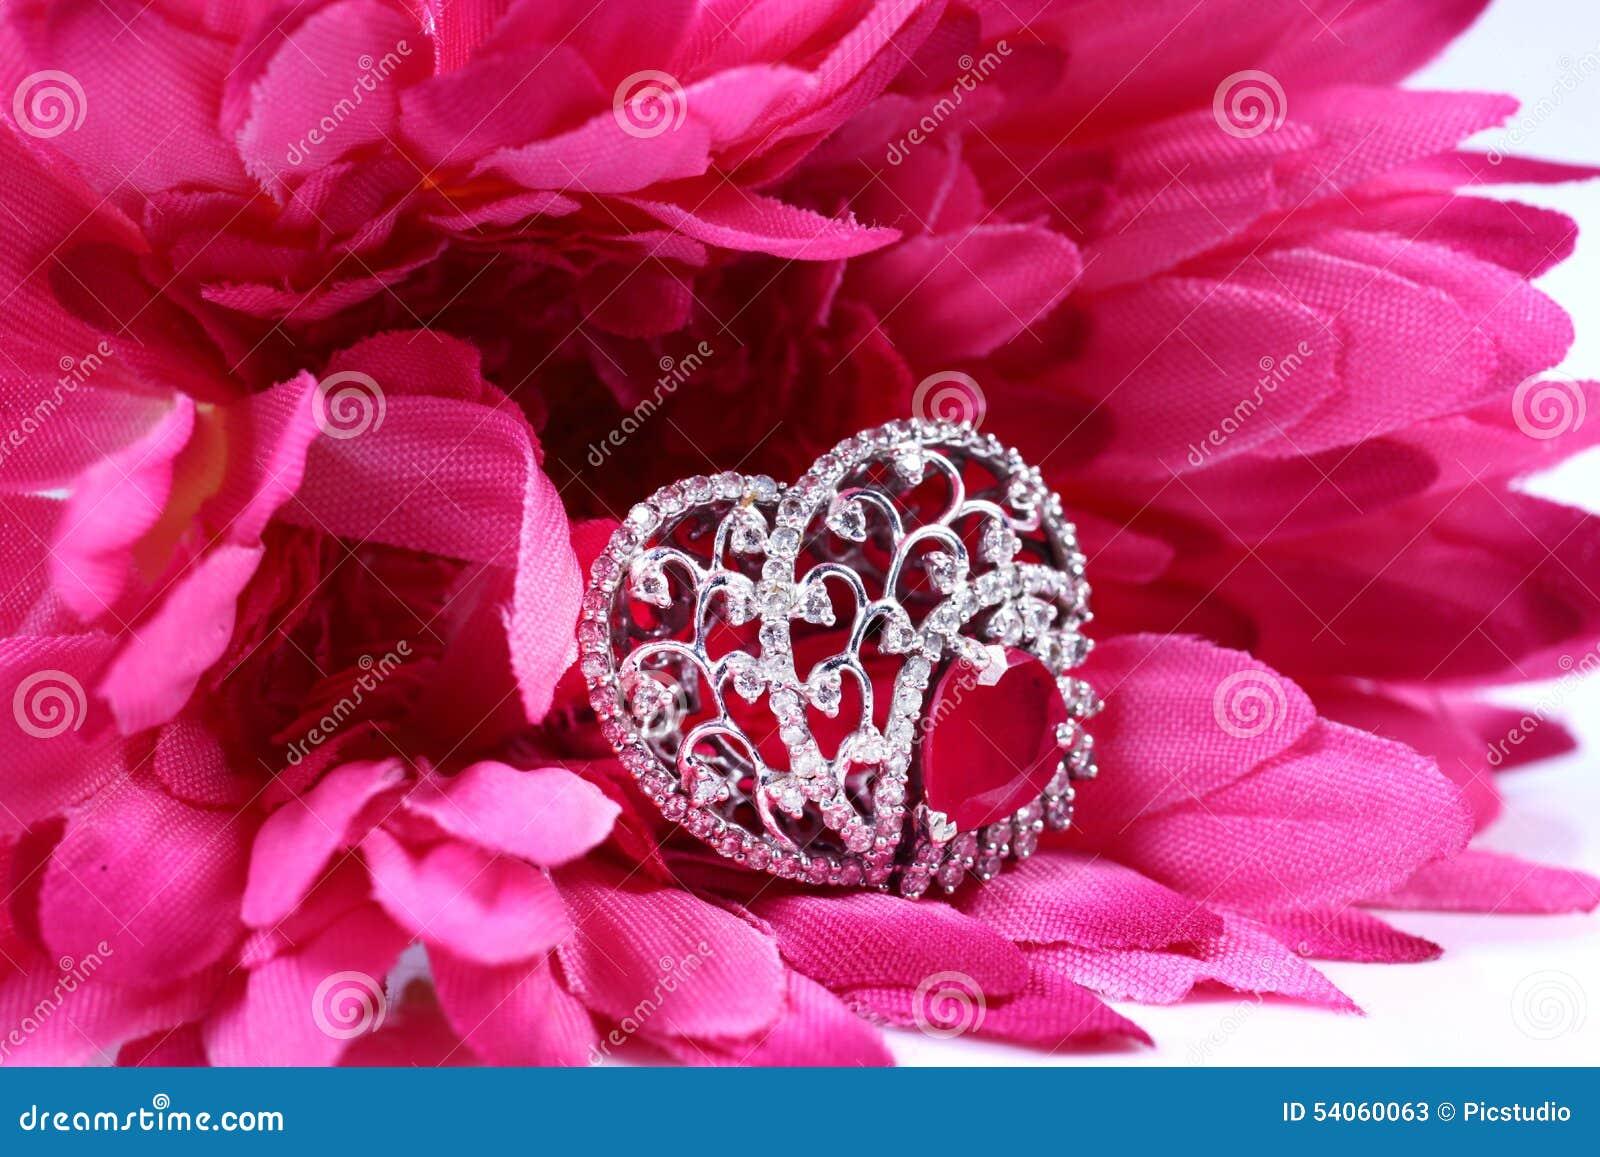 Diamond wedding ring stock image. Image of expensive - 54060063